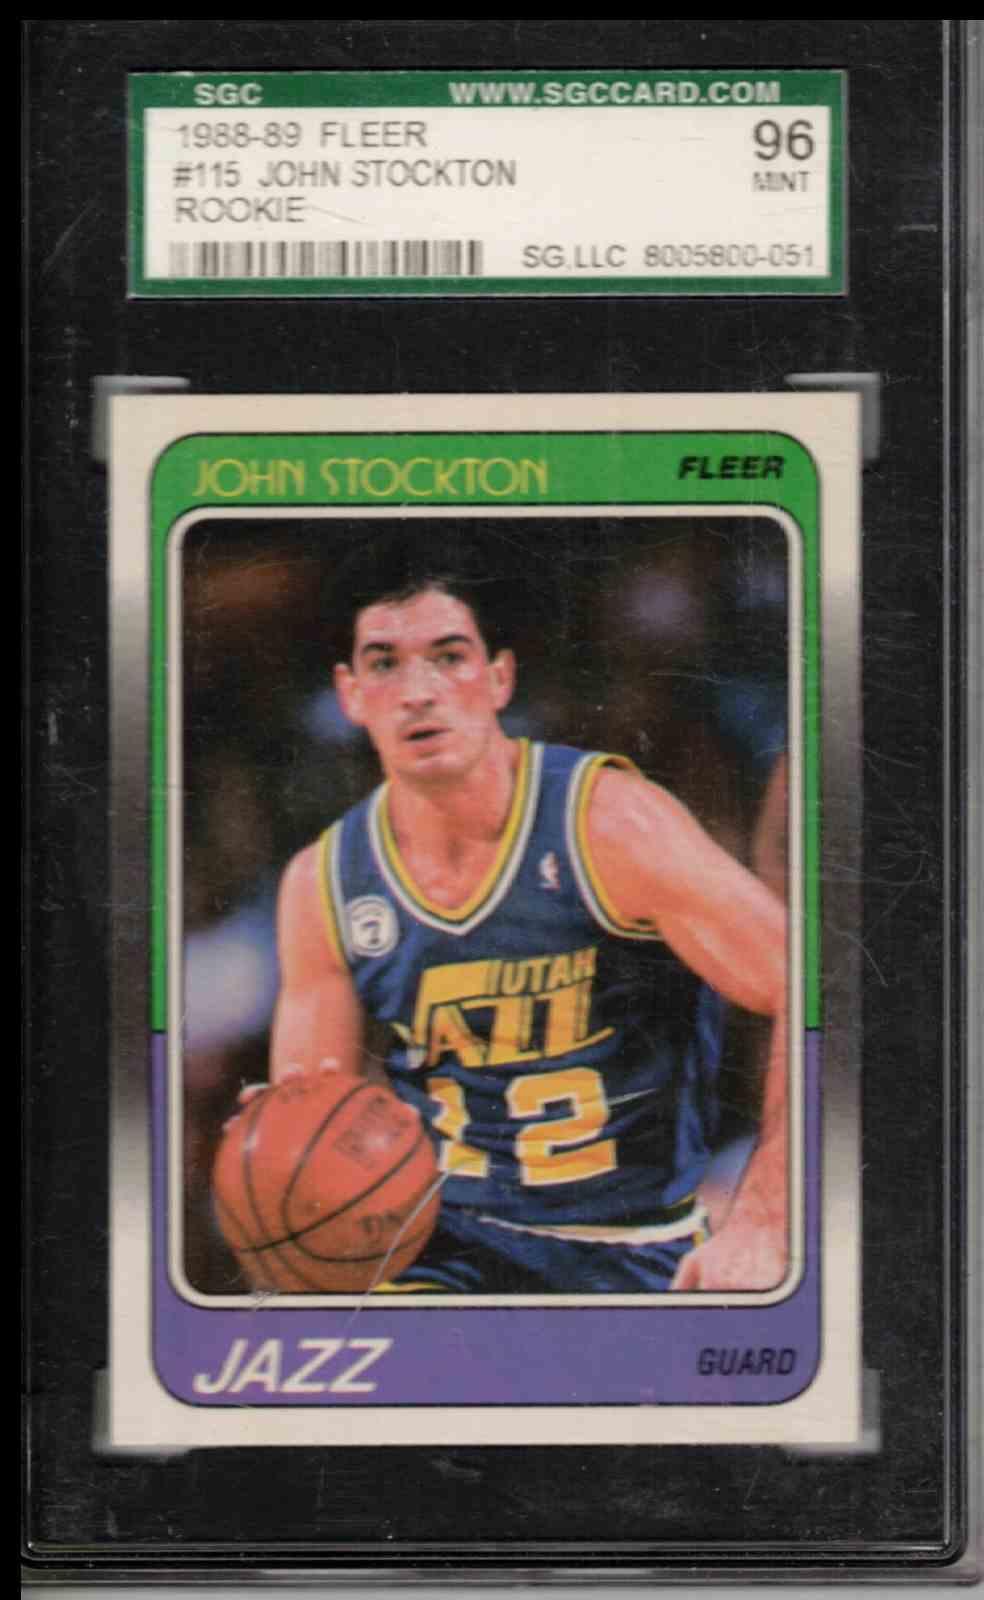 1989 Fleer John Stockton ##115 card front image